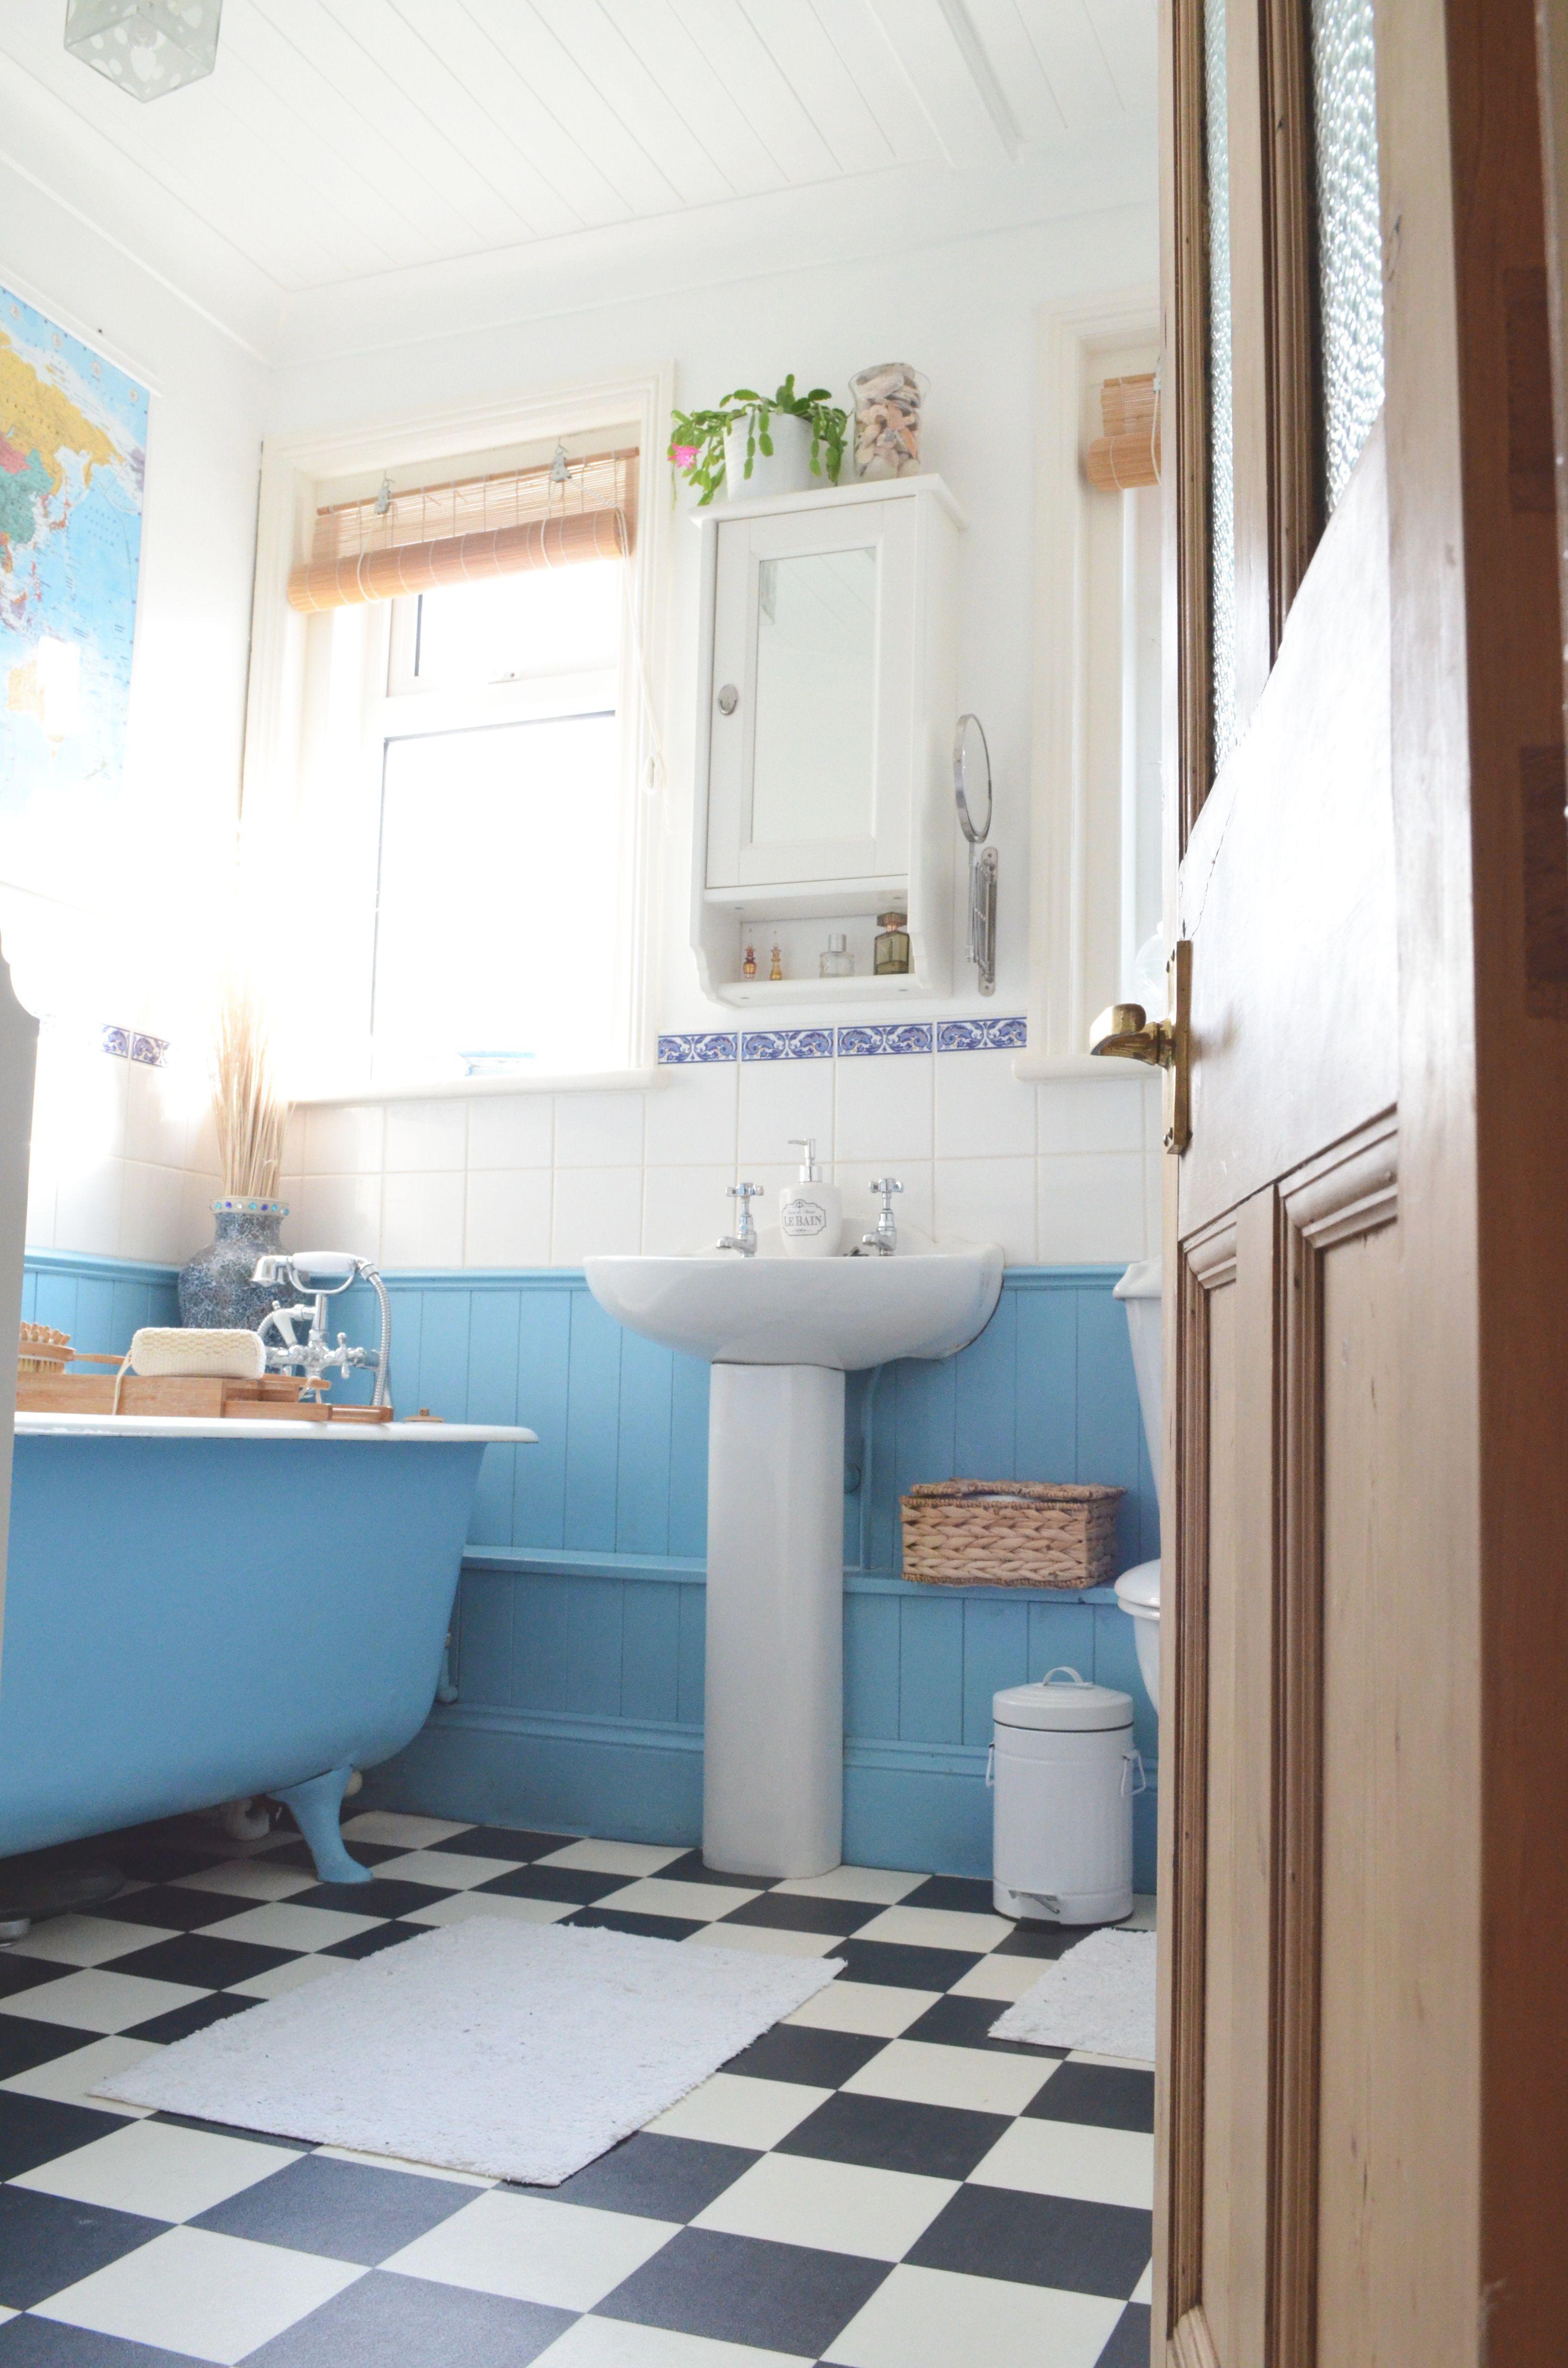 Decocharm bathroom makeover #bathroom #blue #white #traditional | My ...